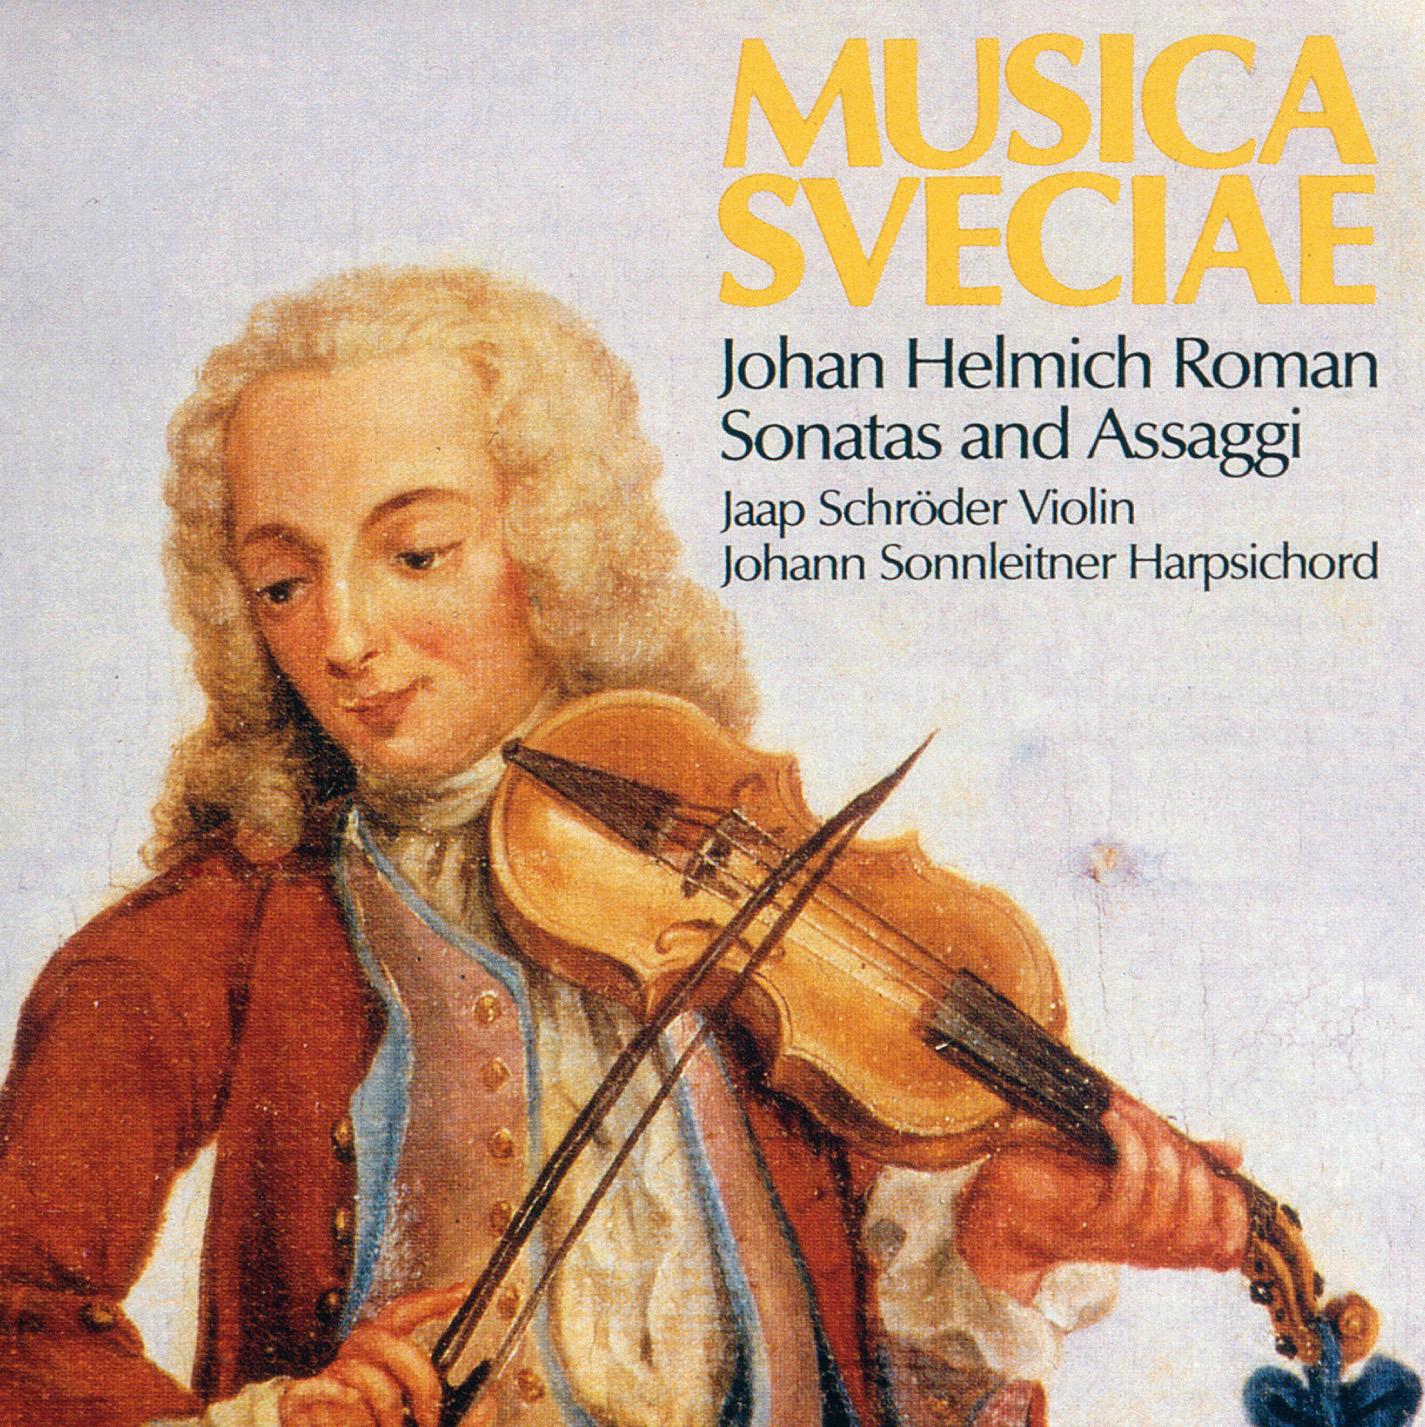 Johan Helmich Roman - Drottningholmsmusiken